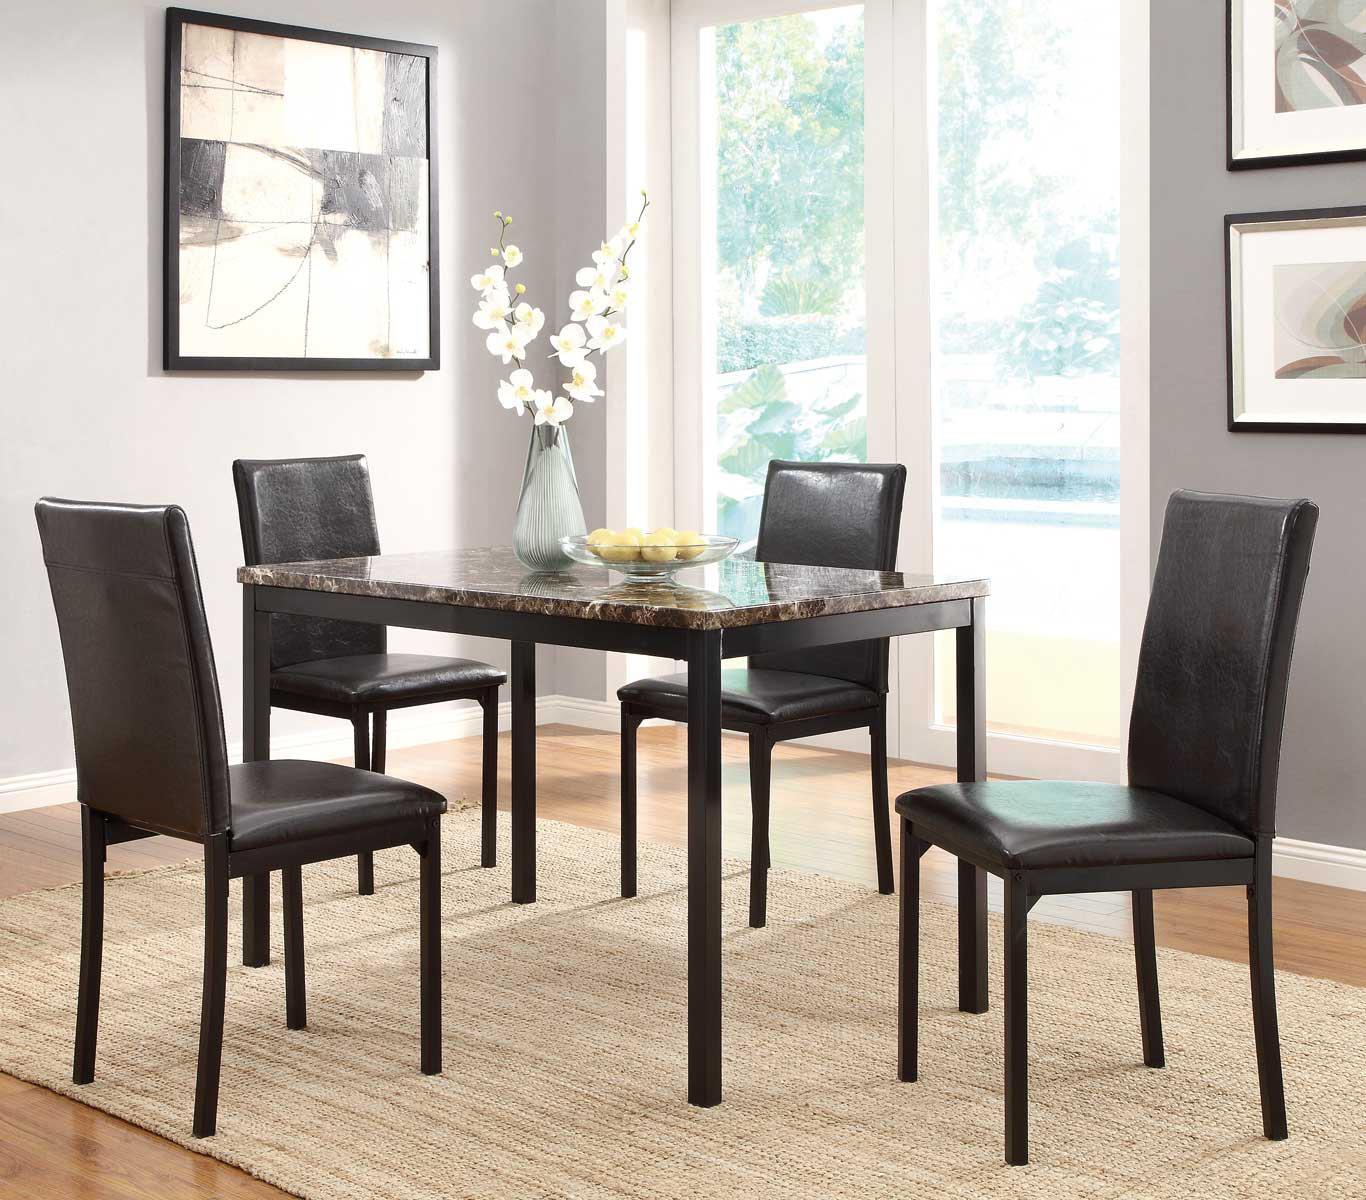 Home elegance 5 piece dining set